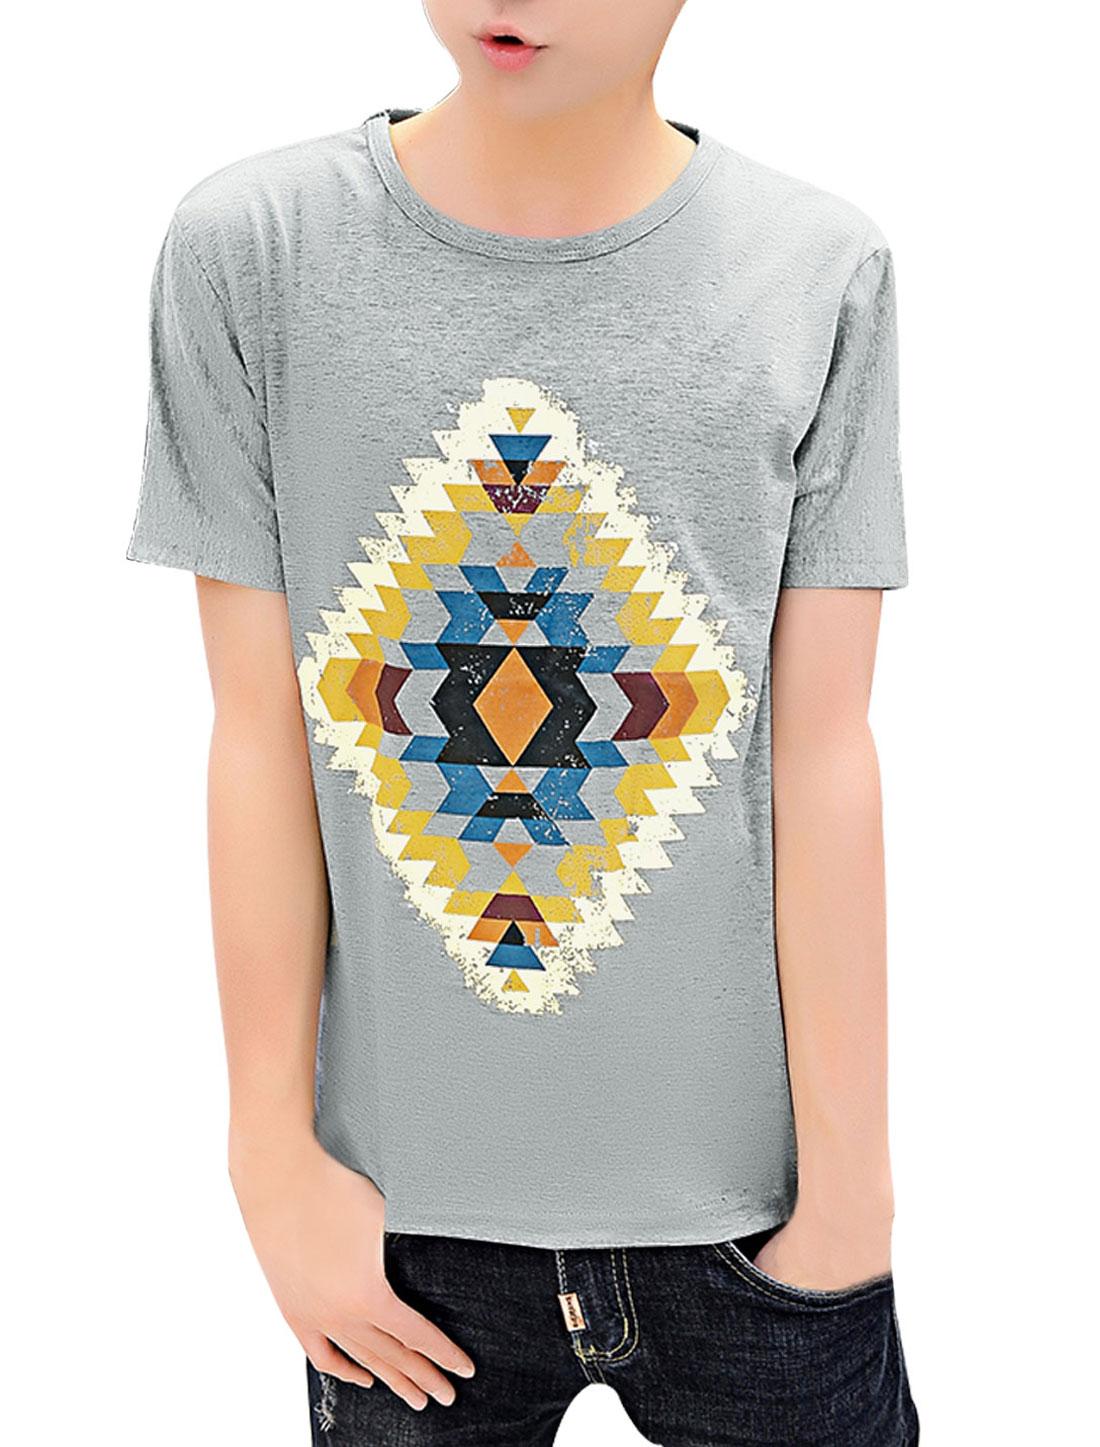 Men Slipover Short Sleeve Round Neck Geometric Print T-Shirt Gray M